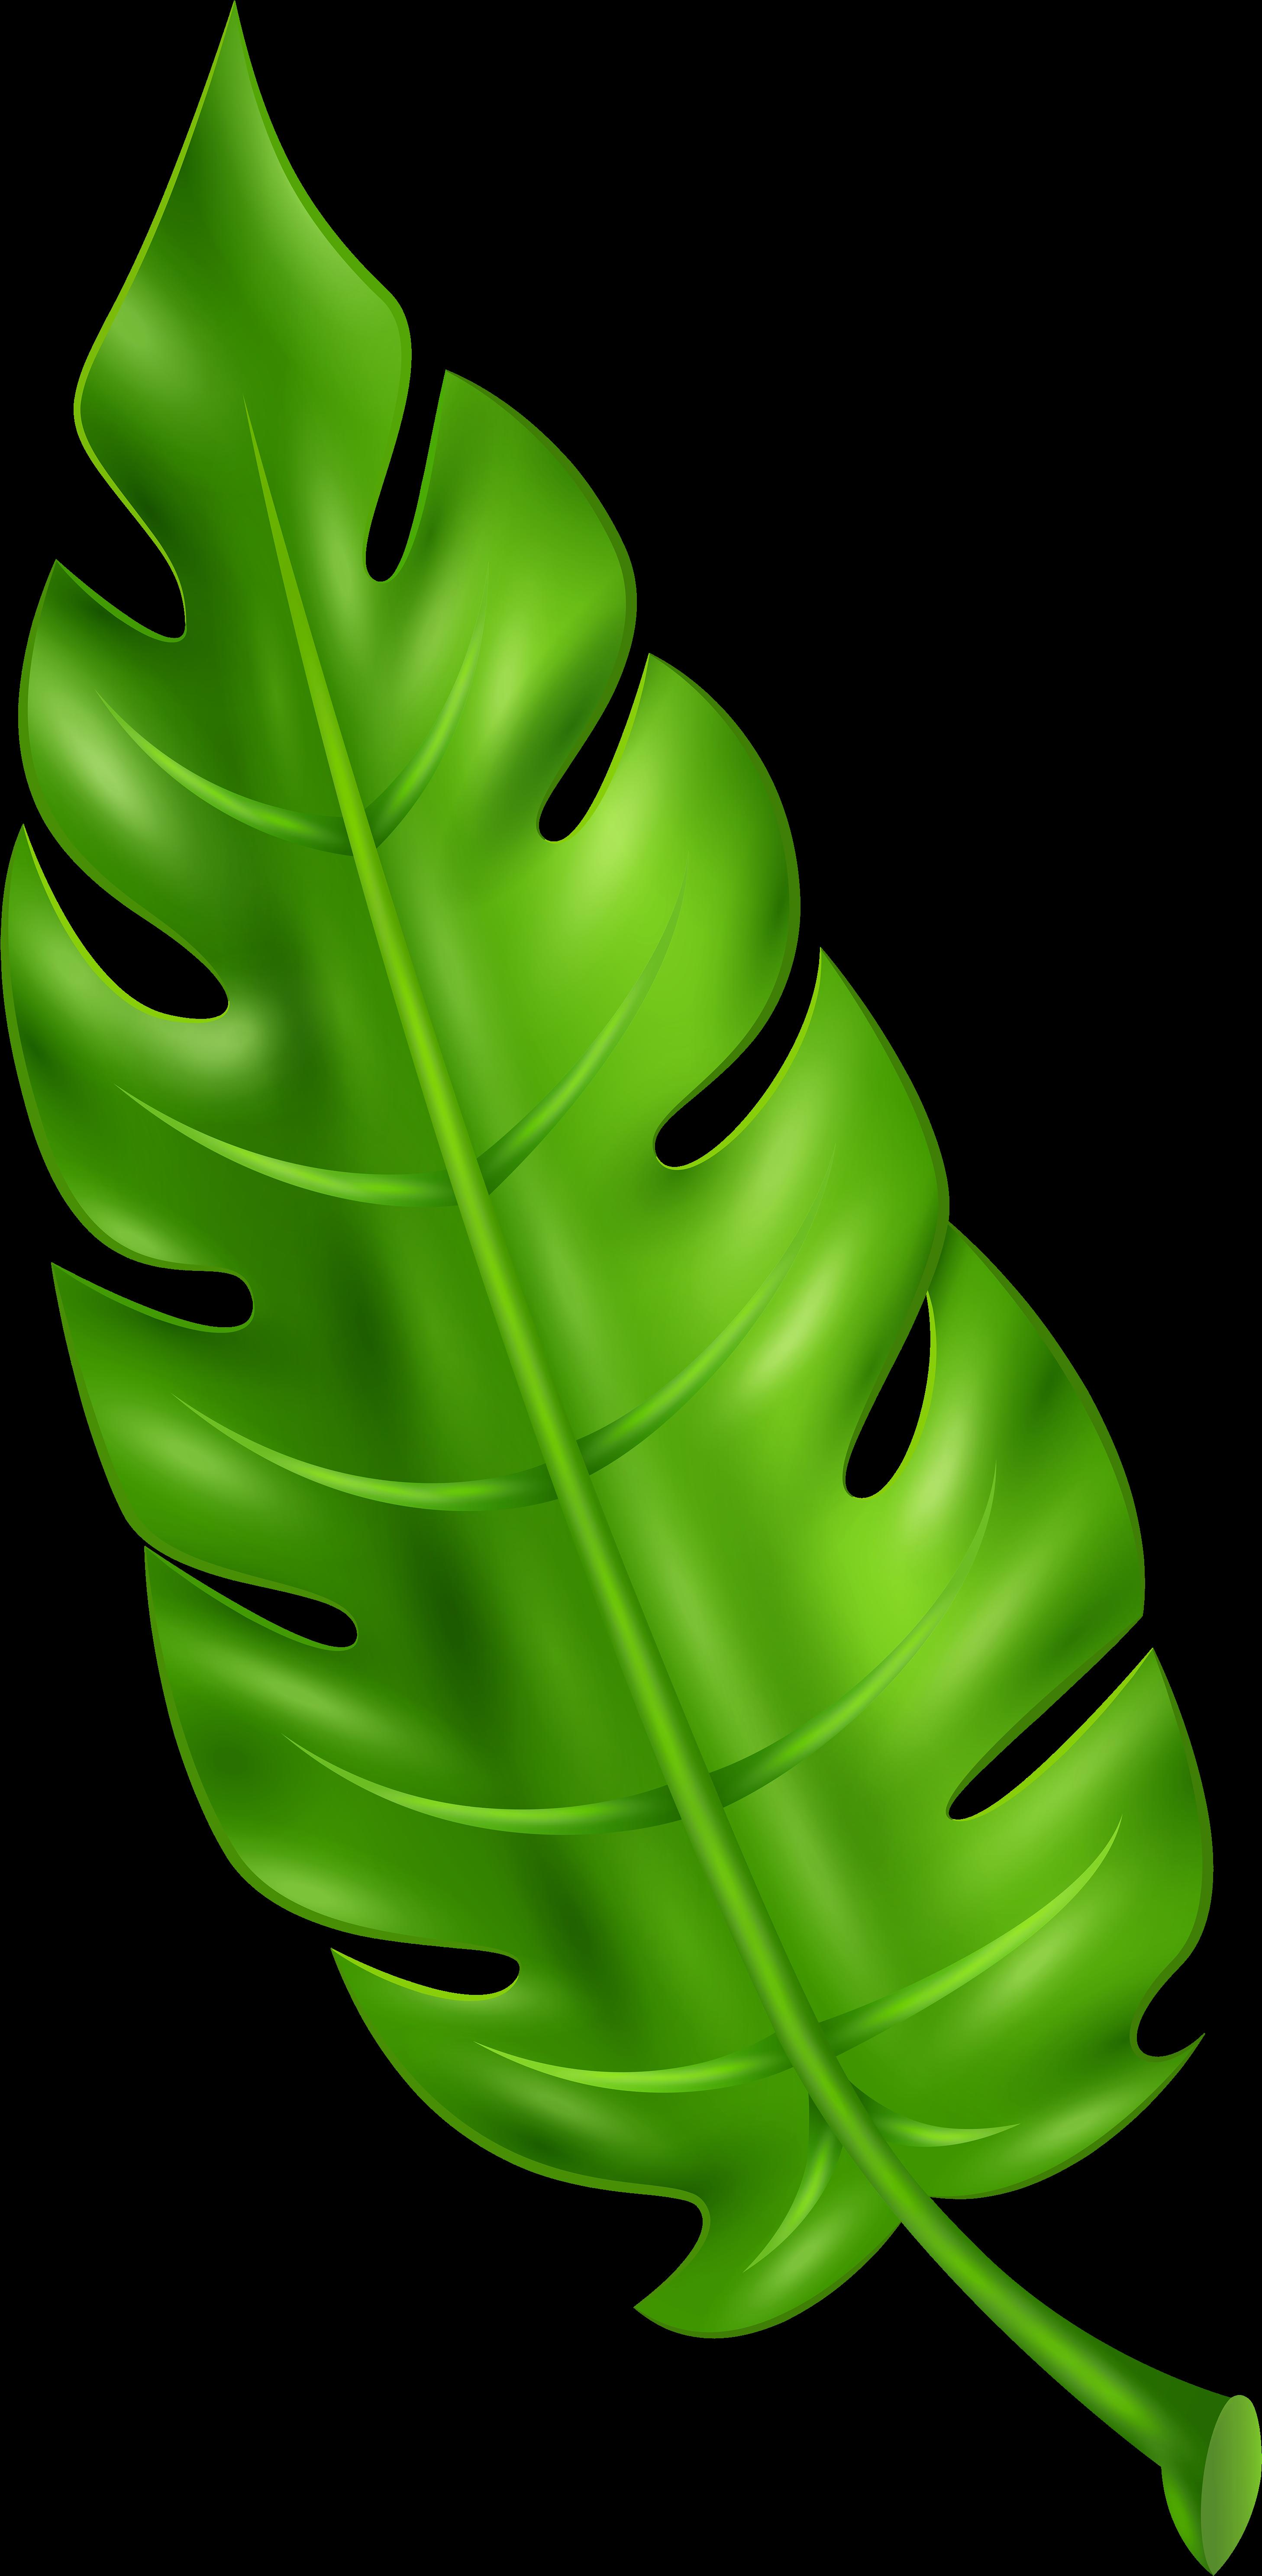 Green Leaf Clipart Leaf Clipart Png Transparent Cartoon Jing Fm